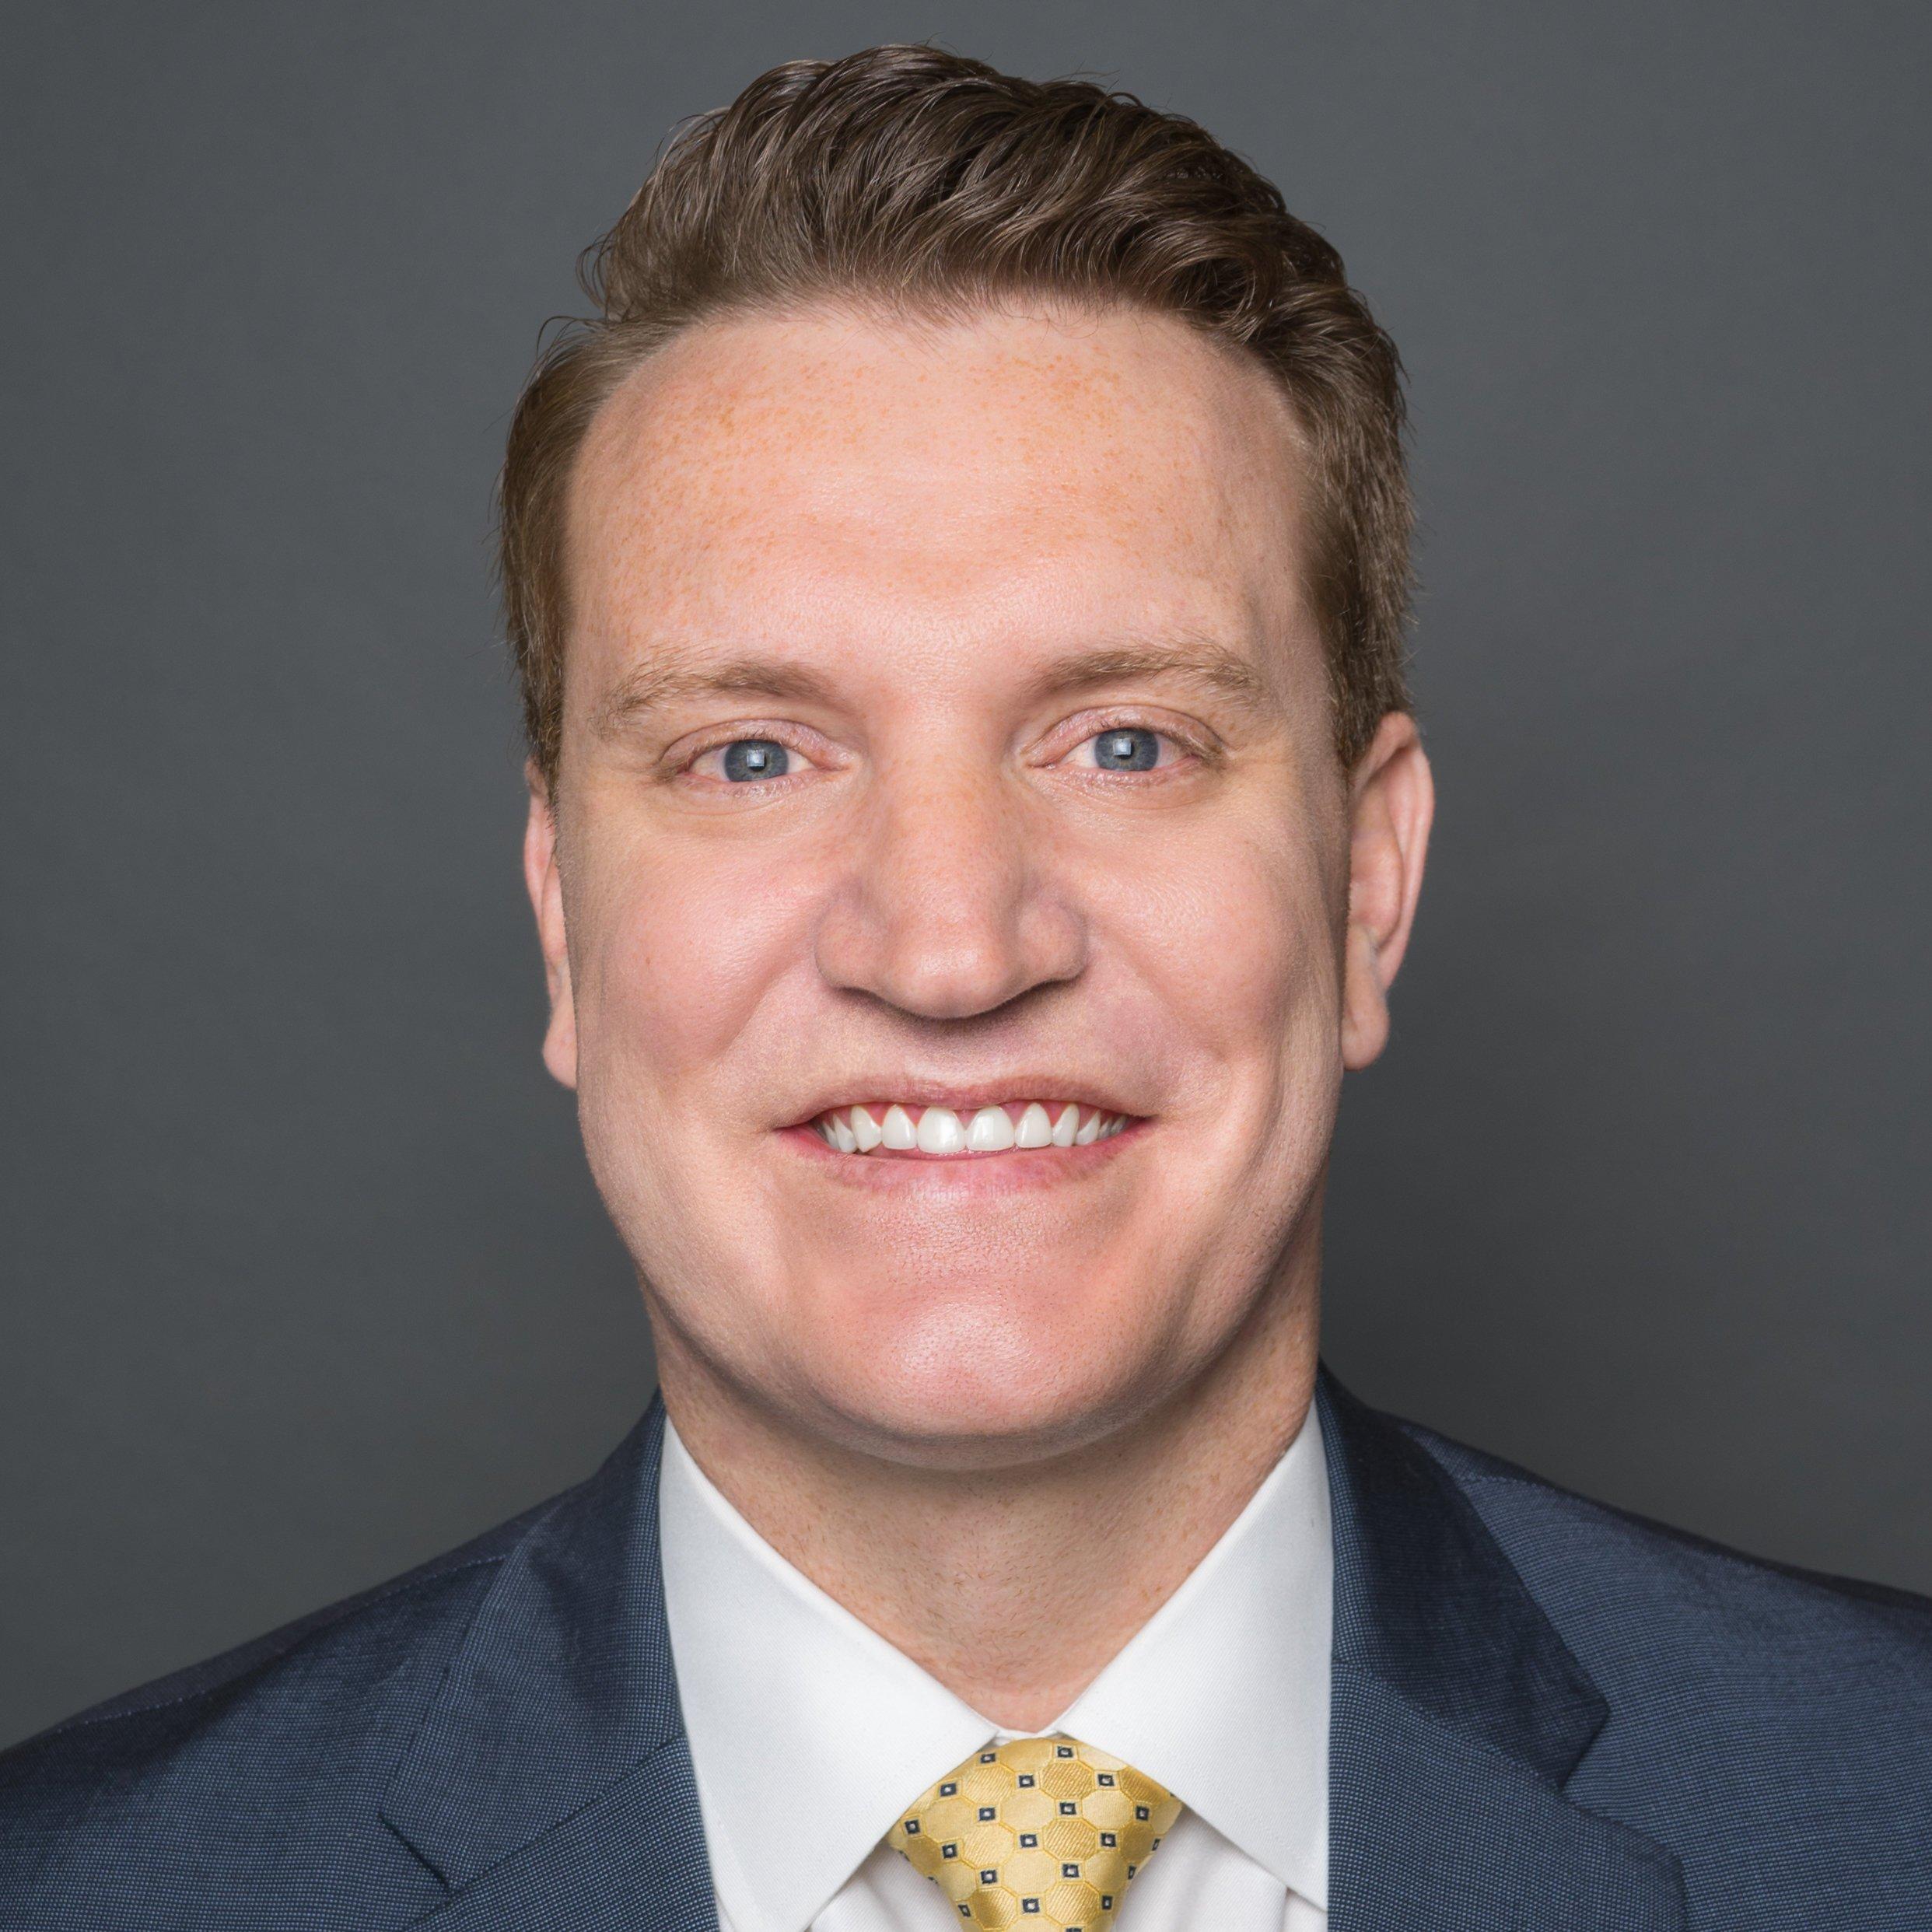 Kyle Pietrzak, Vice President of Risk Management